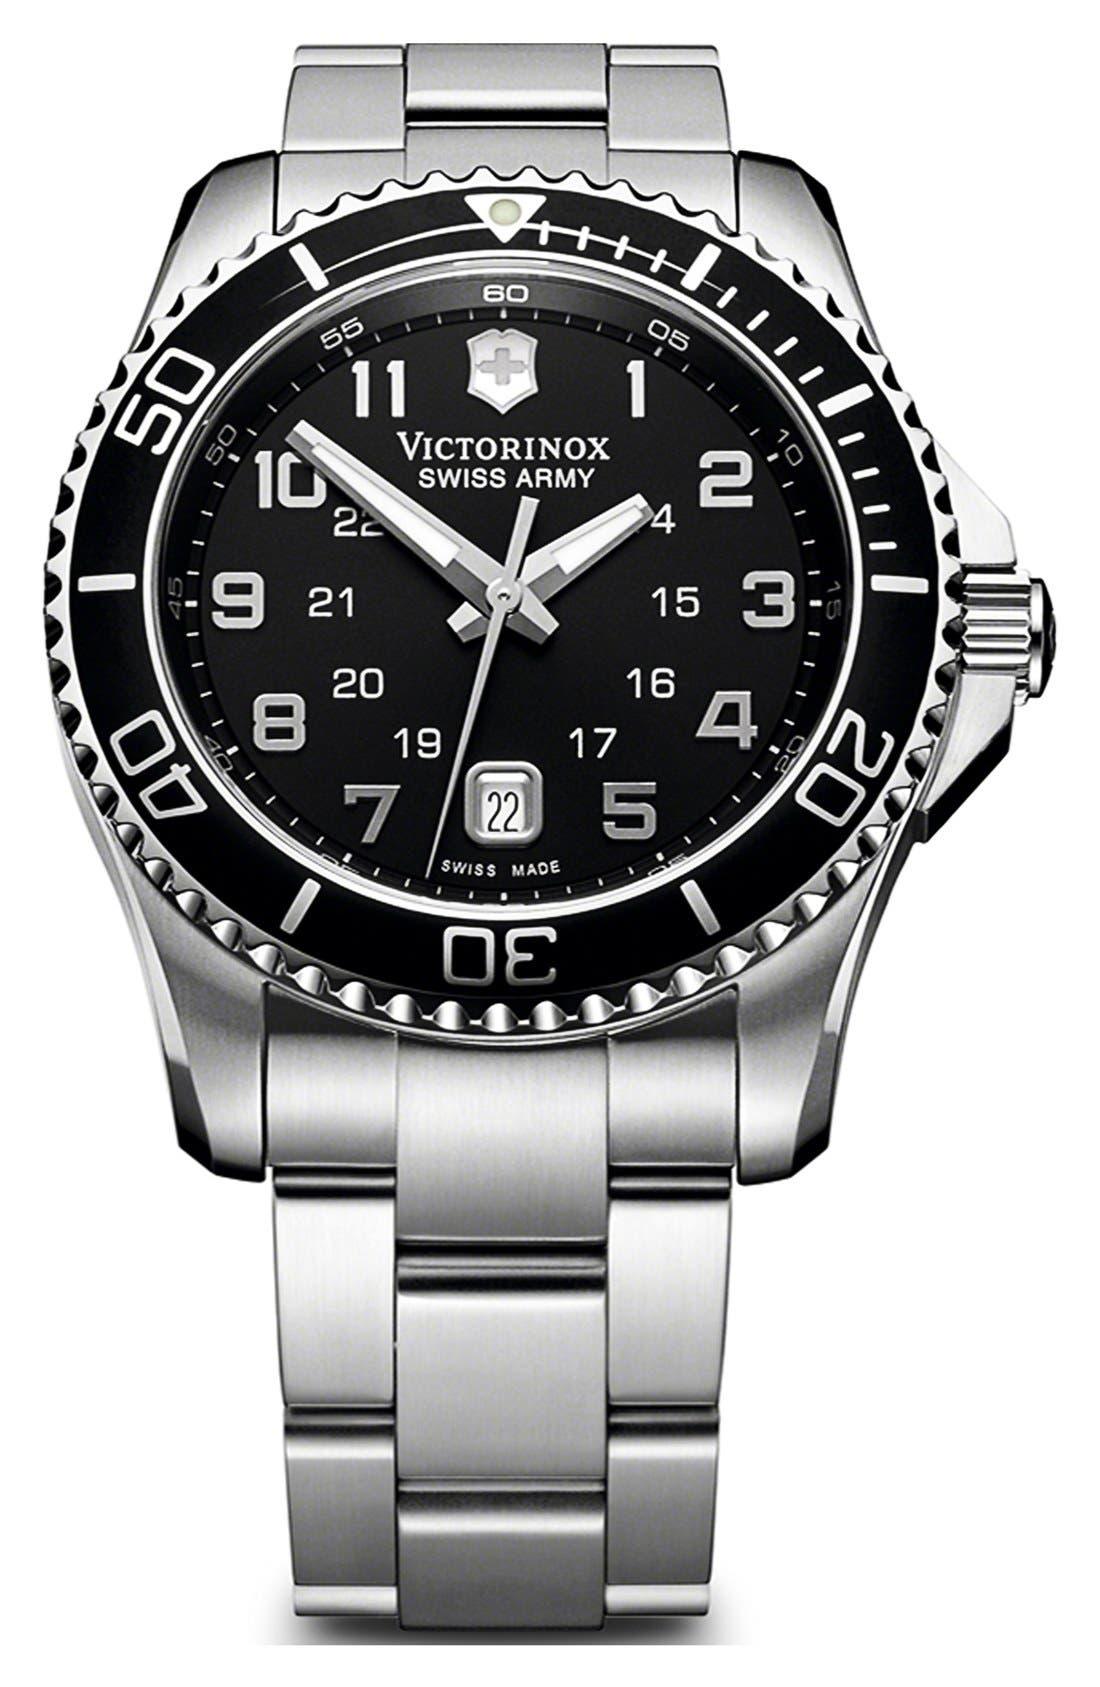 Alternate Image 1 Selected - Victorinox Swiss Army® 'Maverick GS' Stainless Steel Watch, 43mm